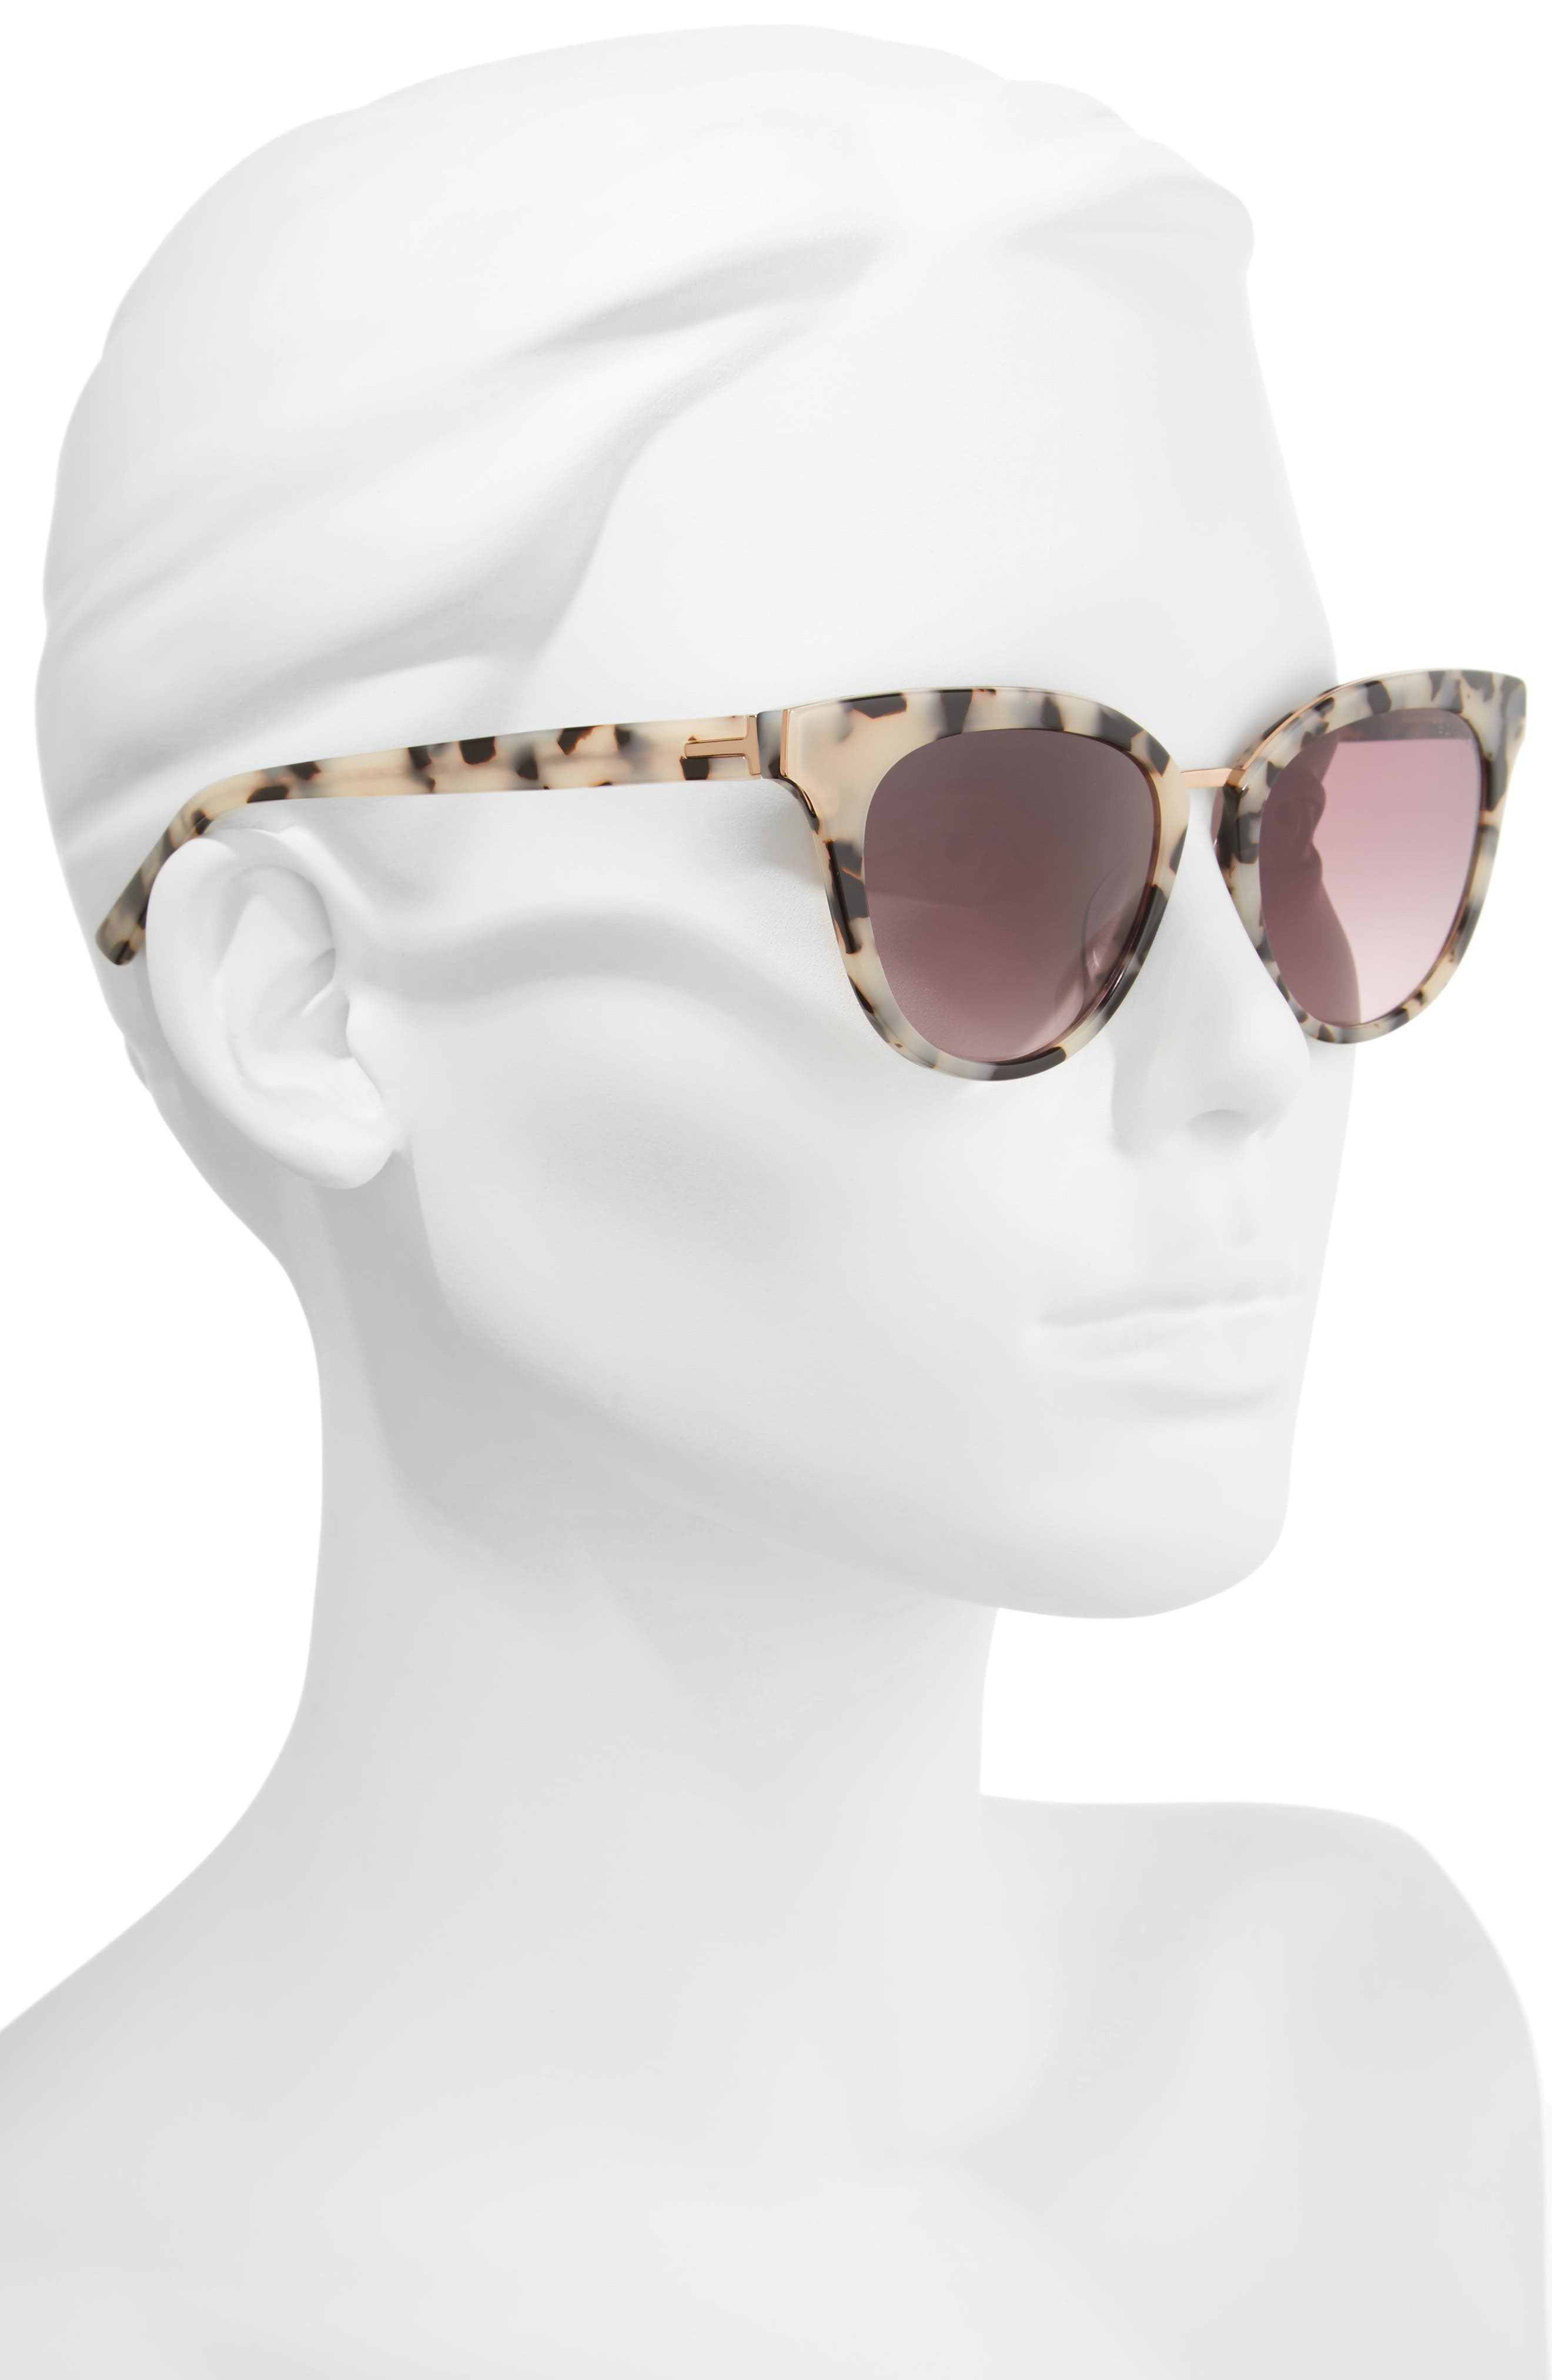 53mm Cat Eye Sunglasses,                             Alternate thumbnail 2, color,                             IVORY